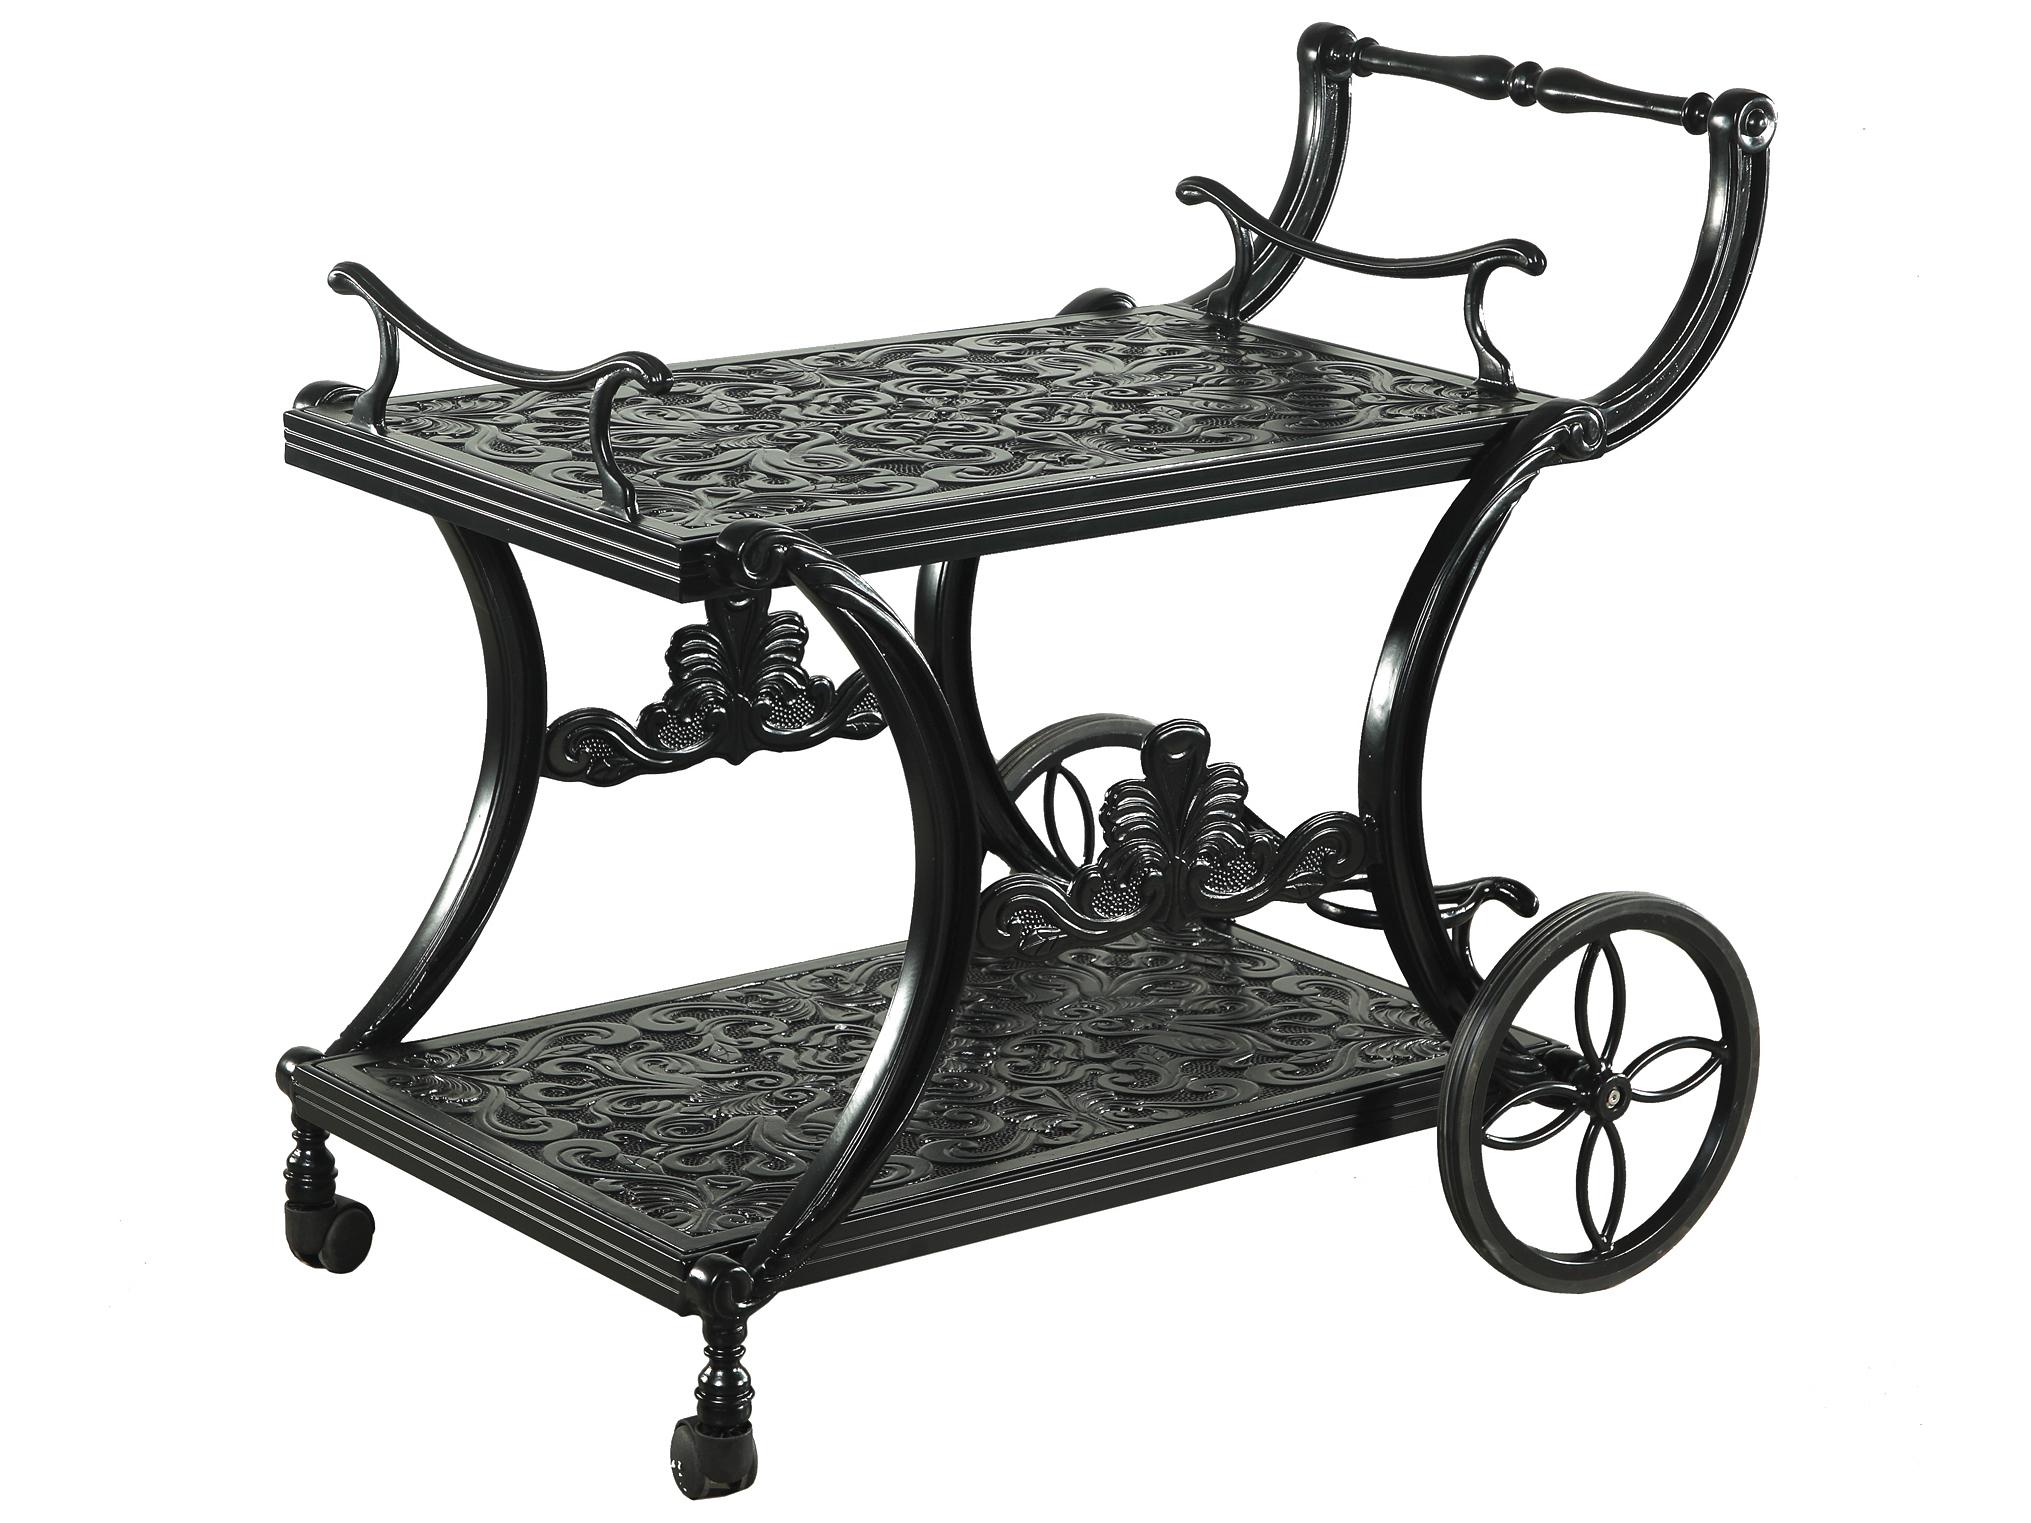 Gensun Regal Accessories Cast Aluminum Serving Cart